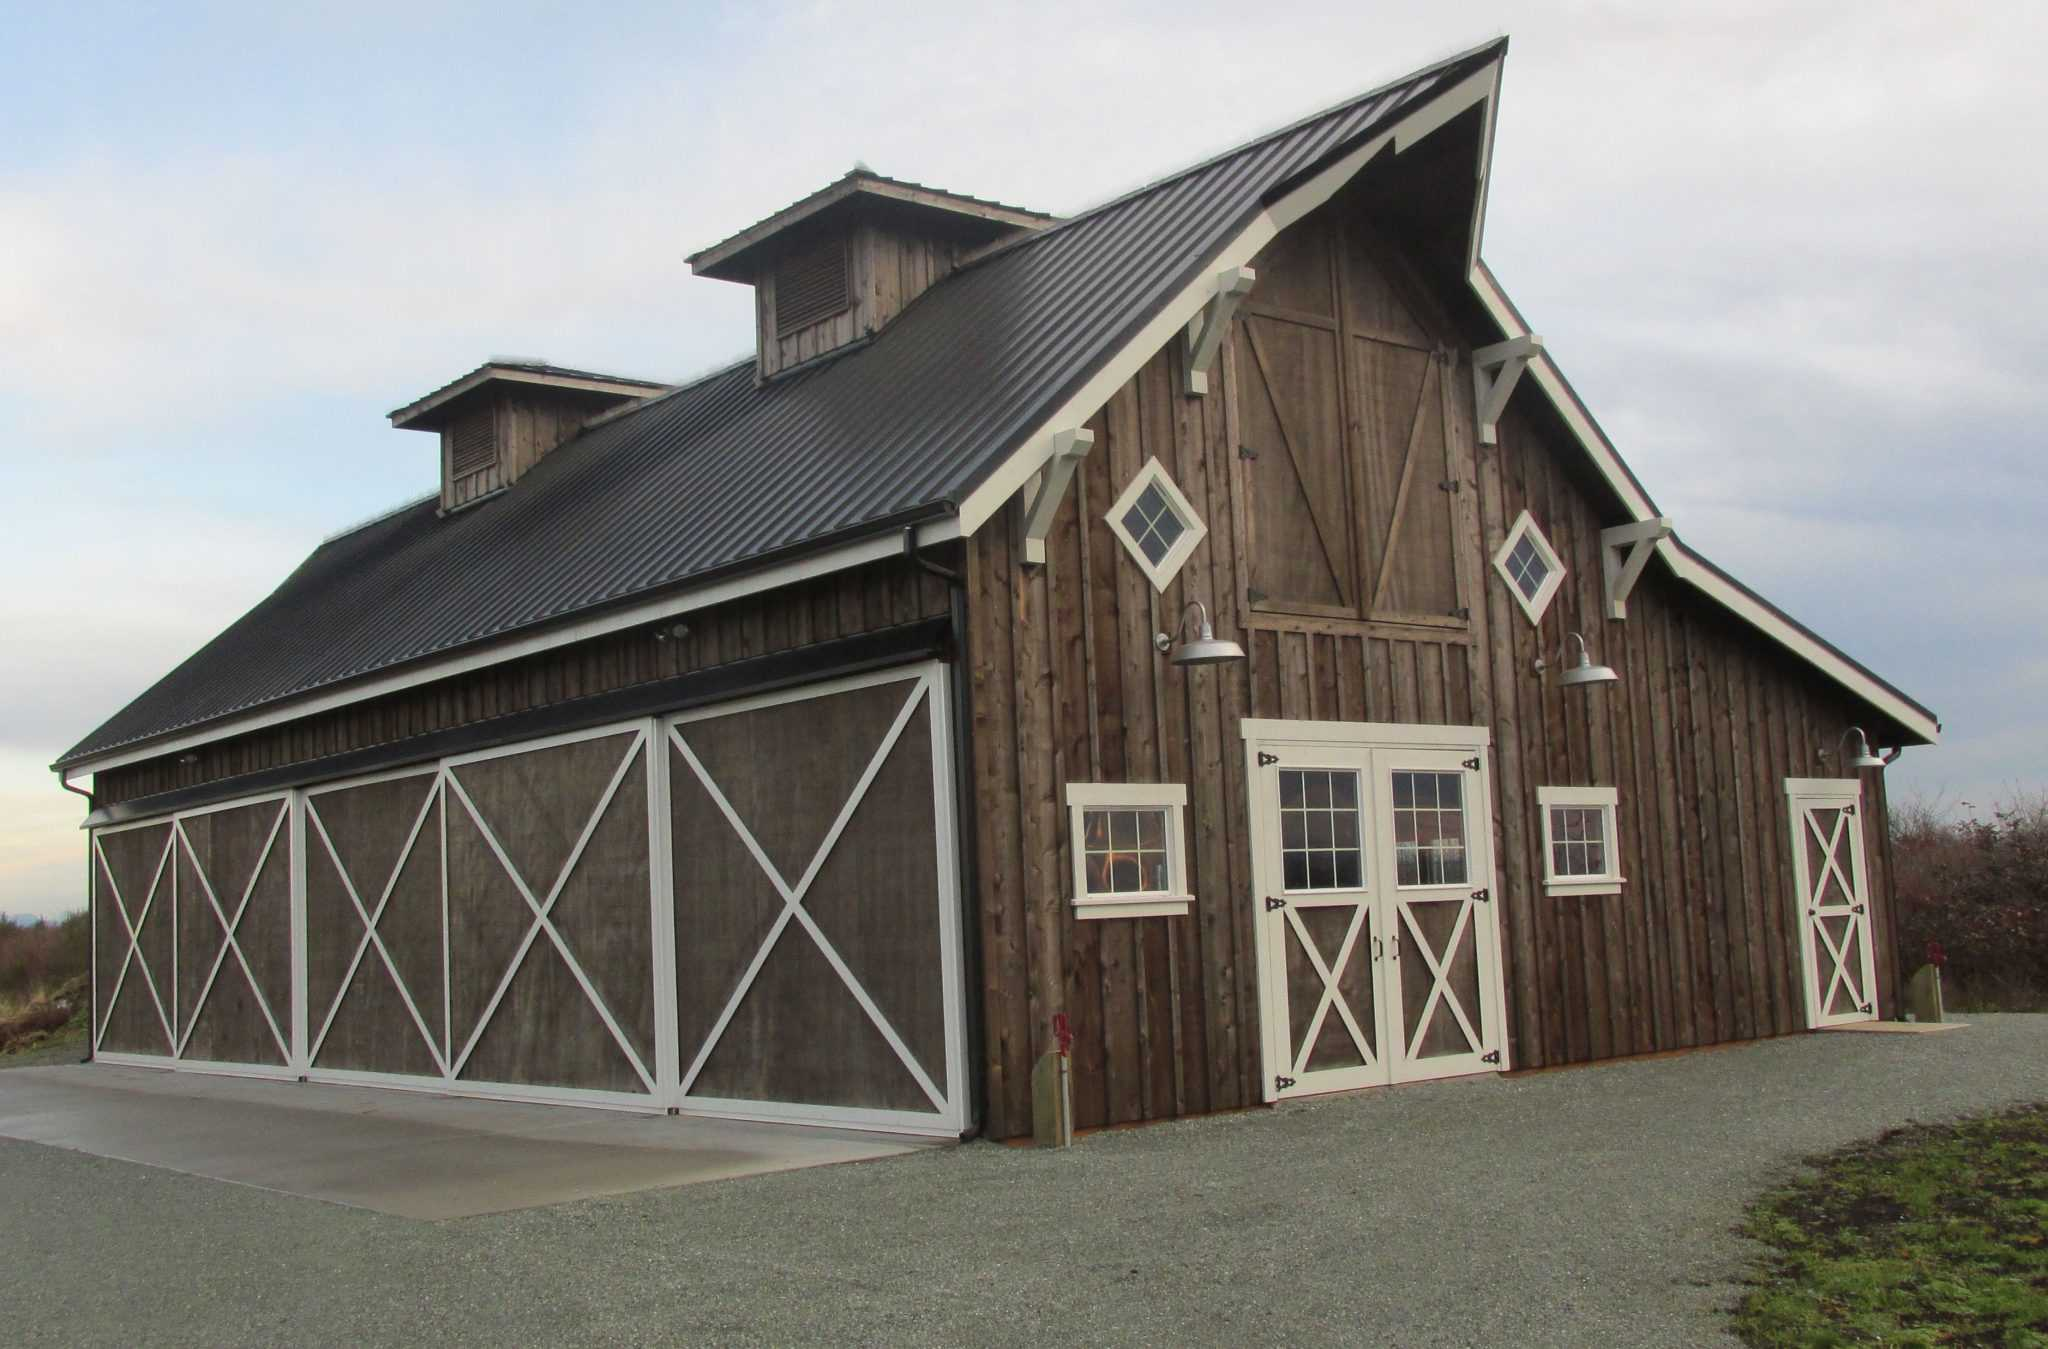 Mcintyre Barn Pole Barn Builder Specializing In Post